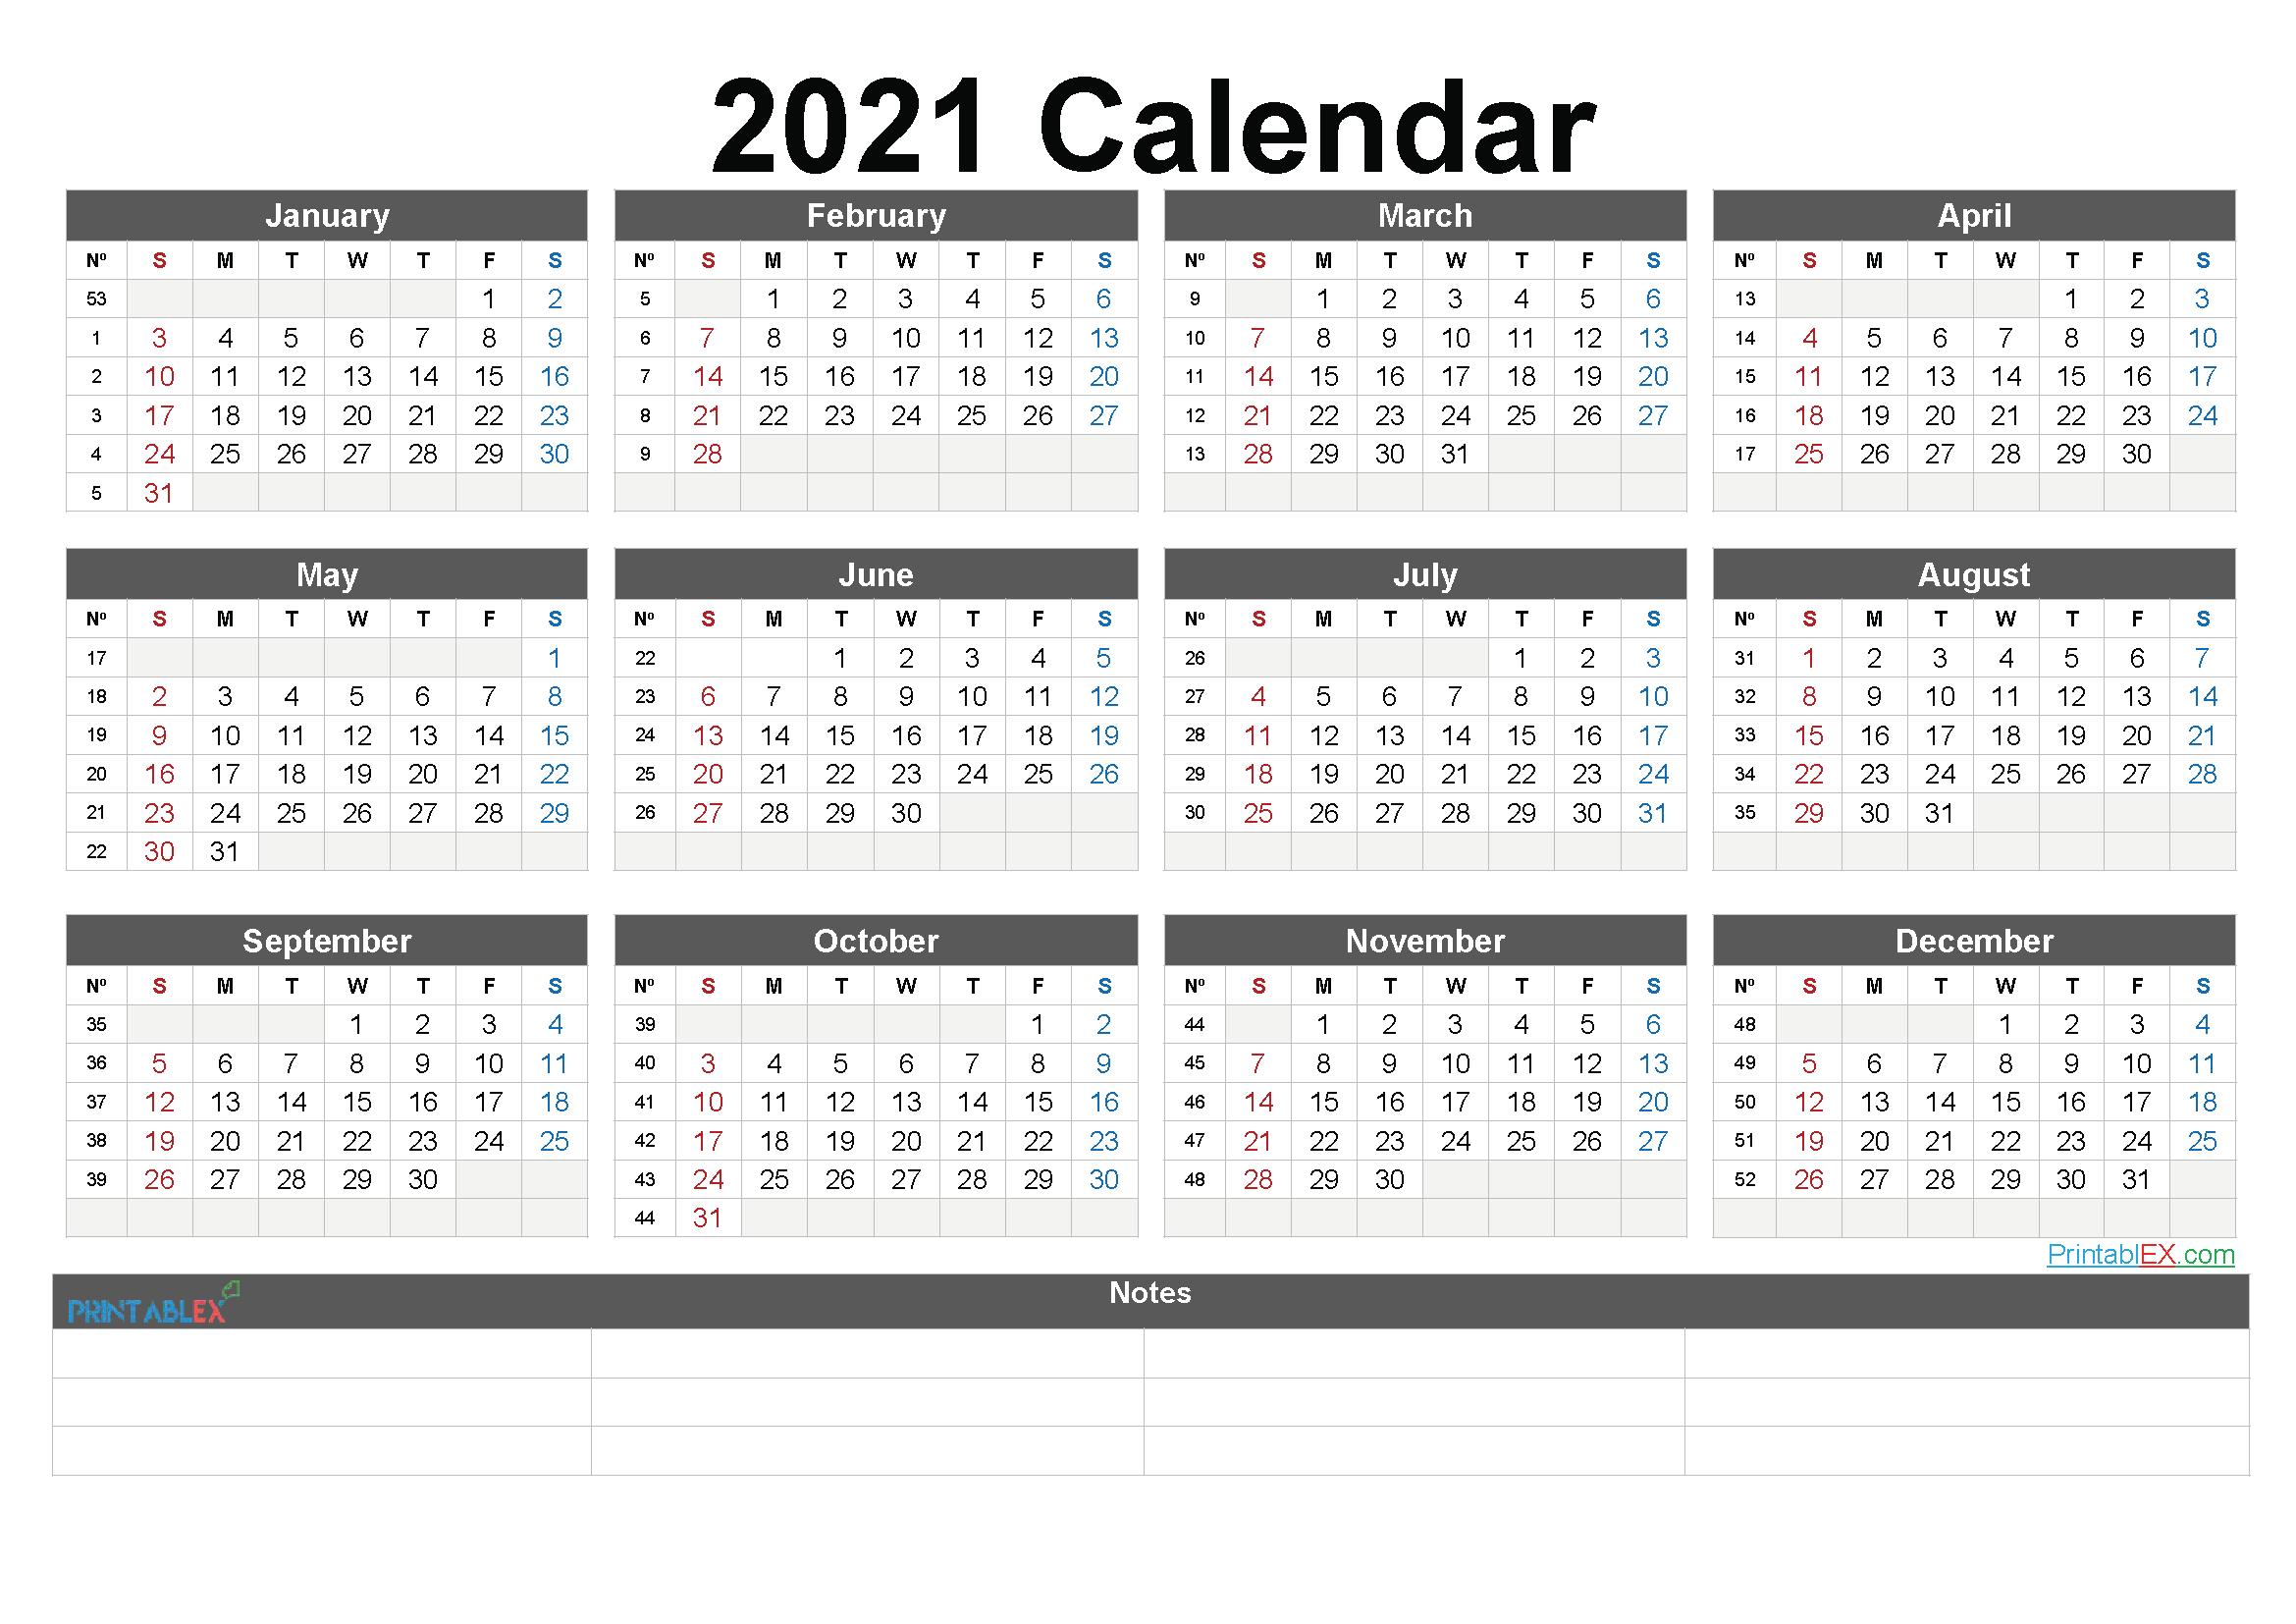 Free Downloadable 2021 Word Calendar - Blank Calendar 2021